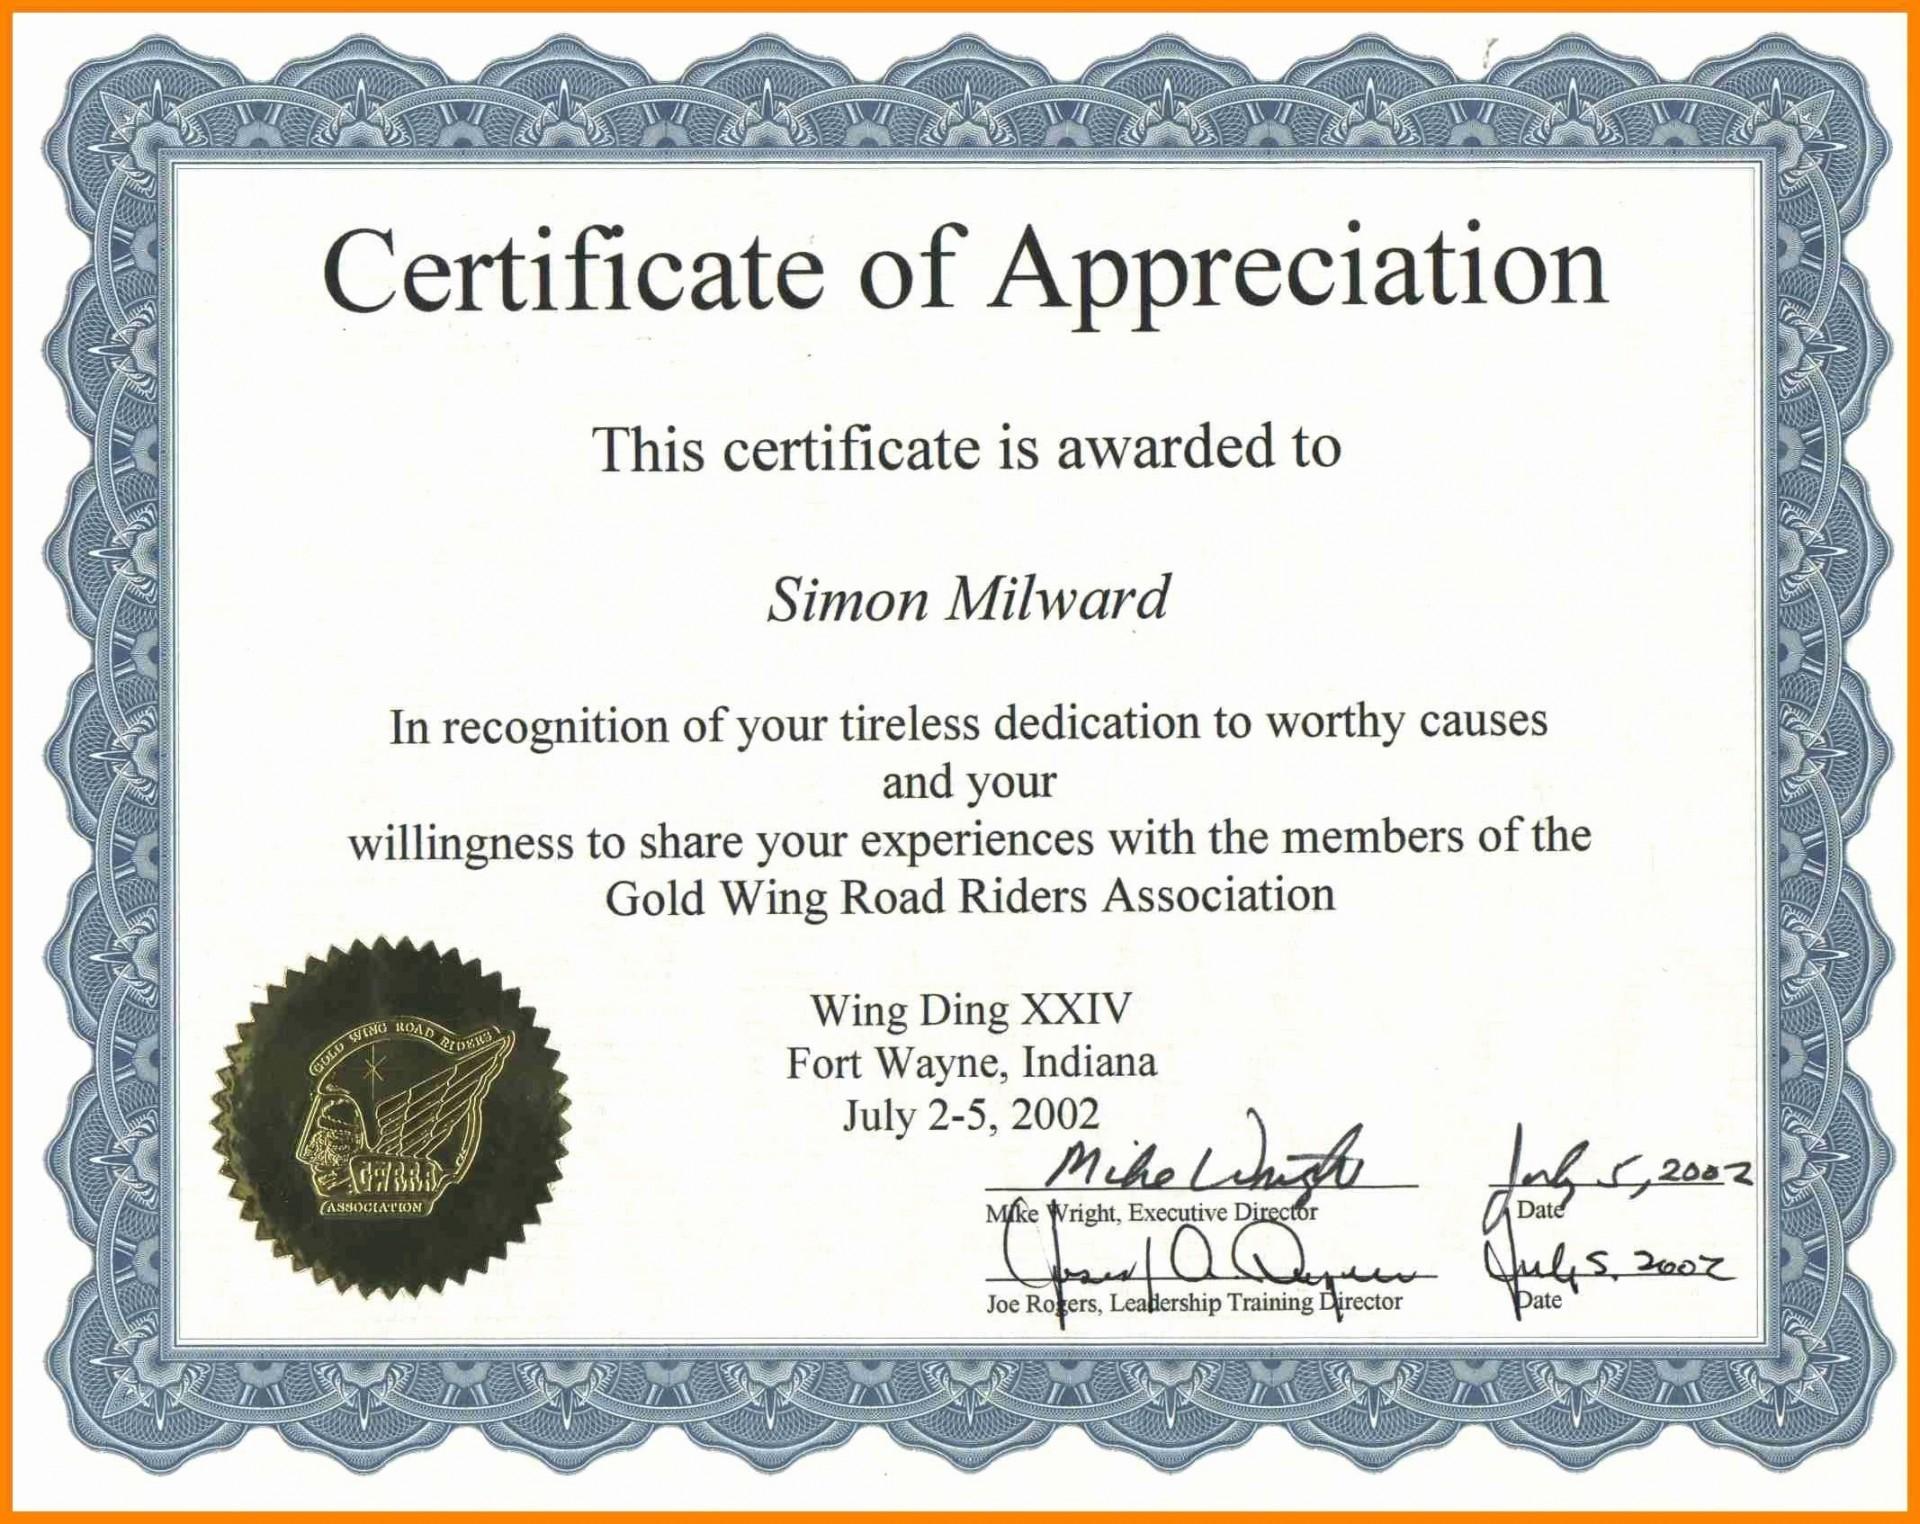 002 Astounding Certificate Of Recognition Sample Wording Inspiration  Award1920